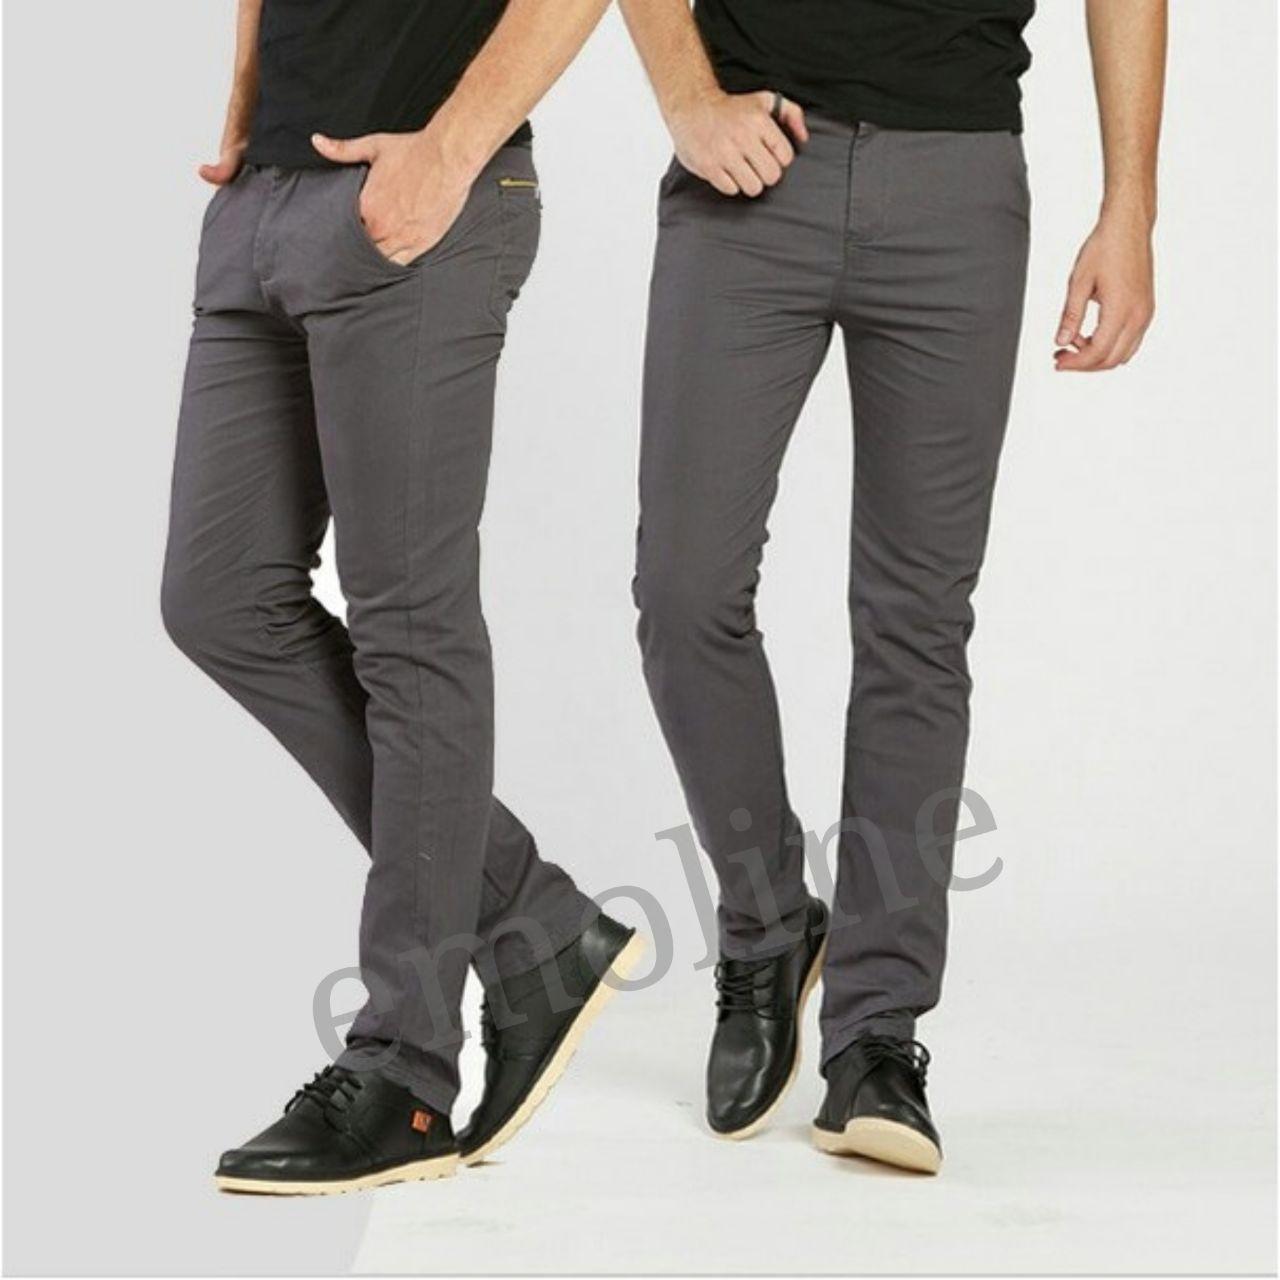 Celana Chino Formal Kasual Pria Lgs Slim Fit Kemeja Fashion Biru Muda Denim Polos S Panjang